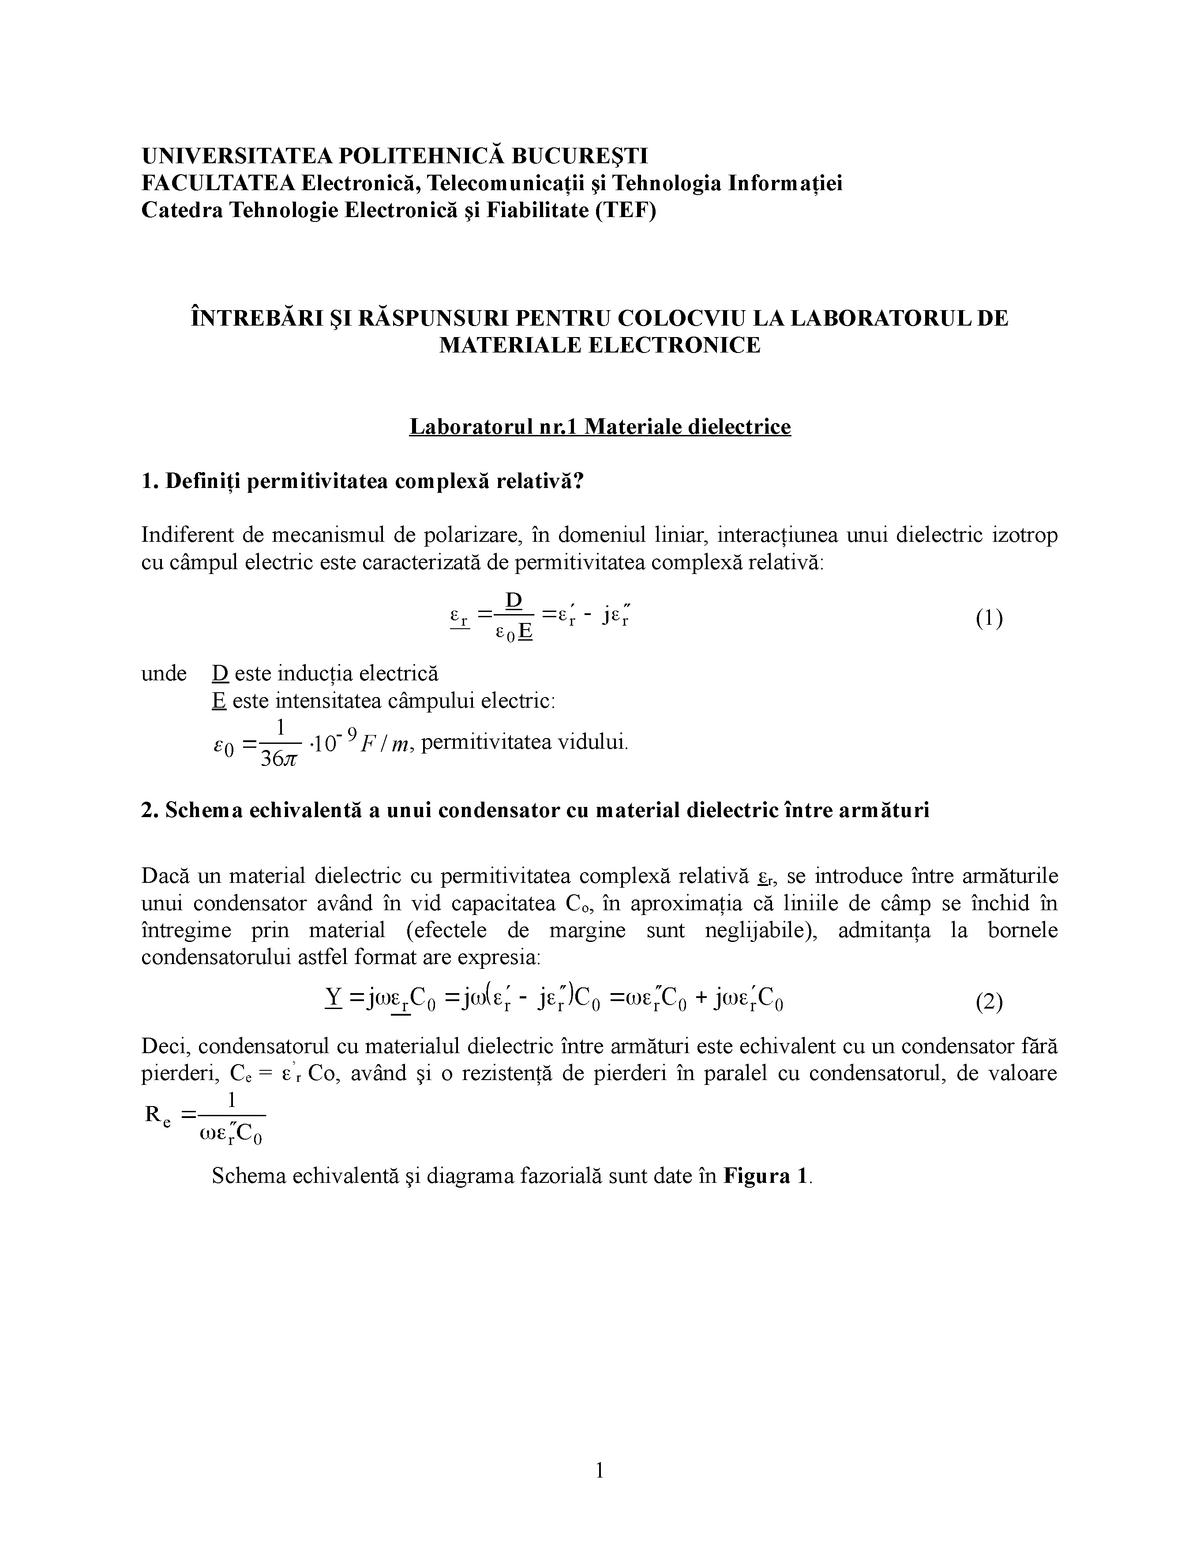 Rezumate lab - Materiale electrice - Analiza matematica